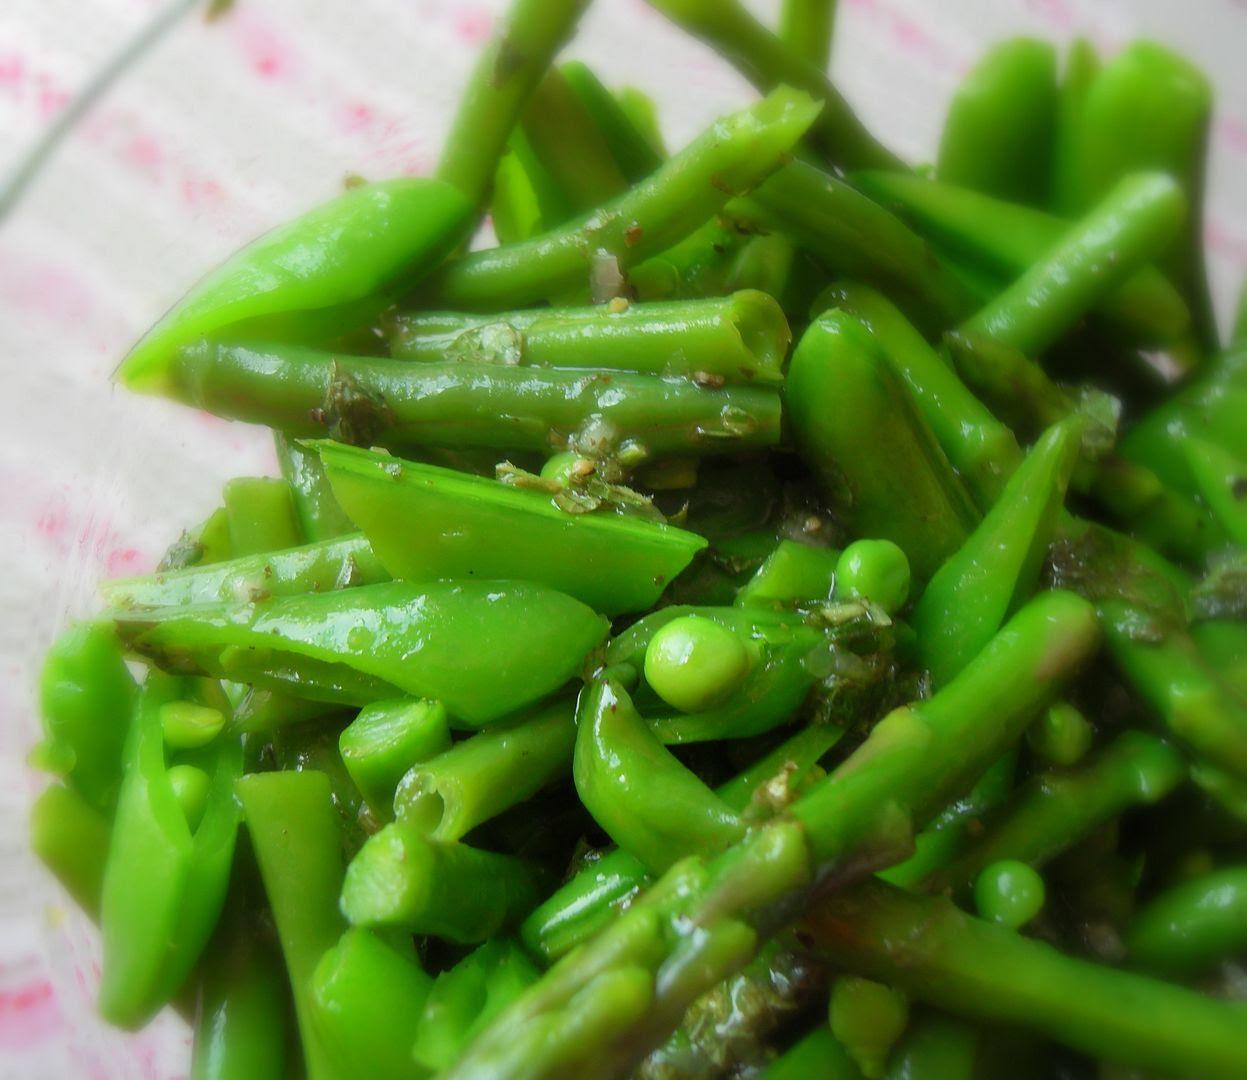 Summer Salad of Peas, Beans and Asparagus